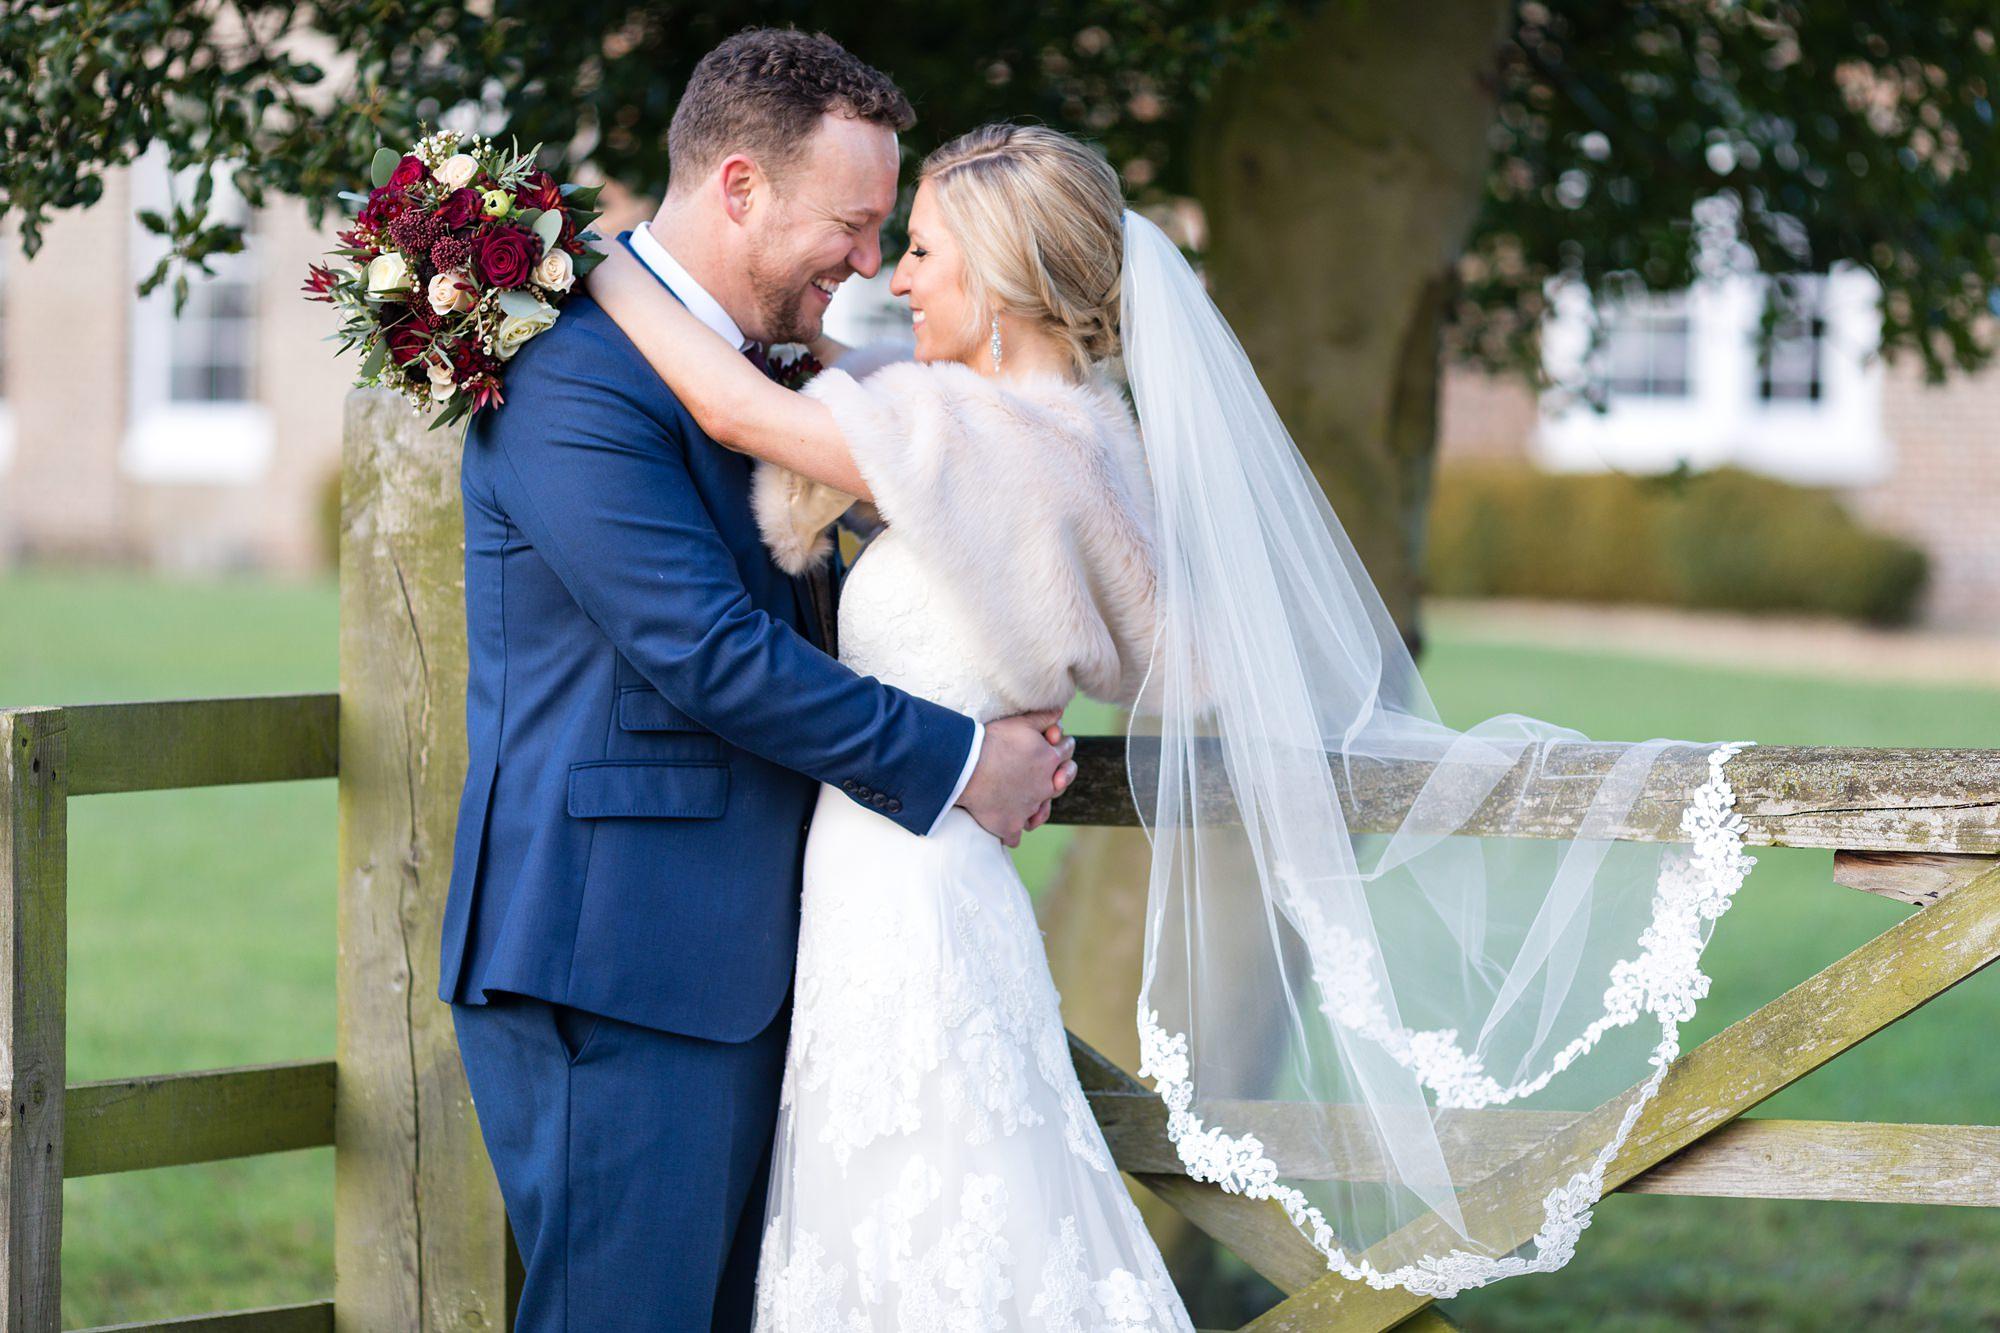 York Wedding Photography at Hornington Manor Farm bride and groom portraits by back gate